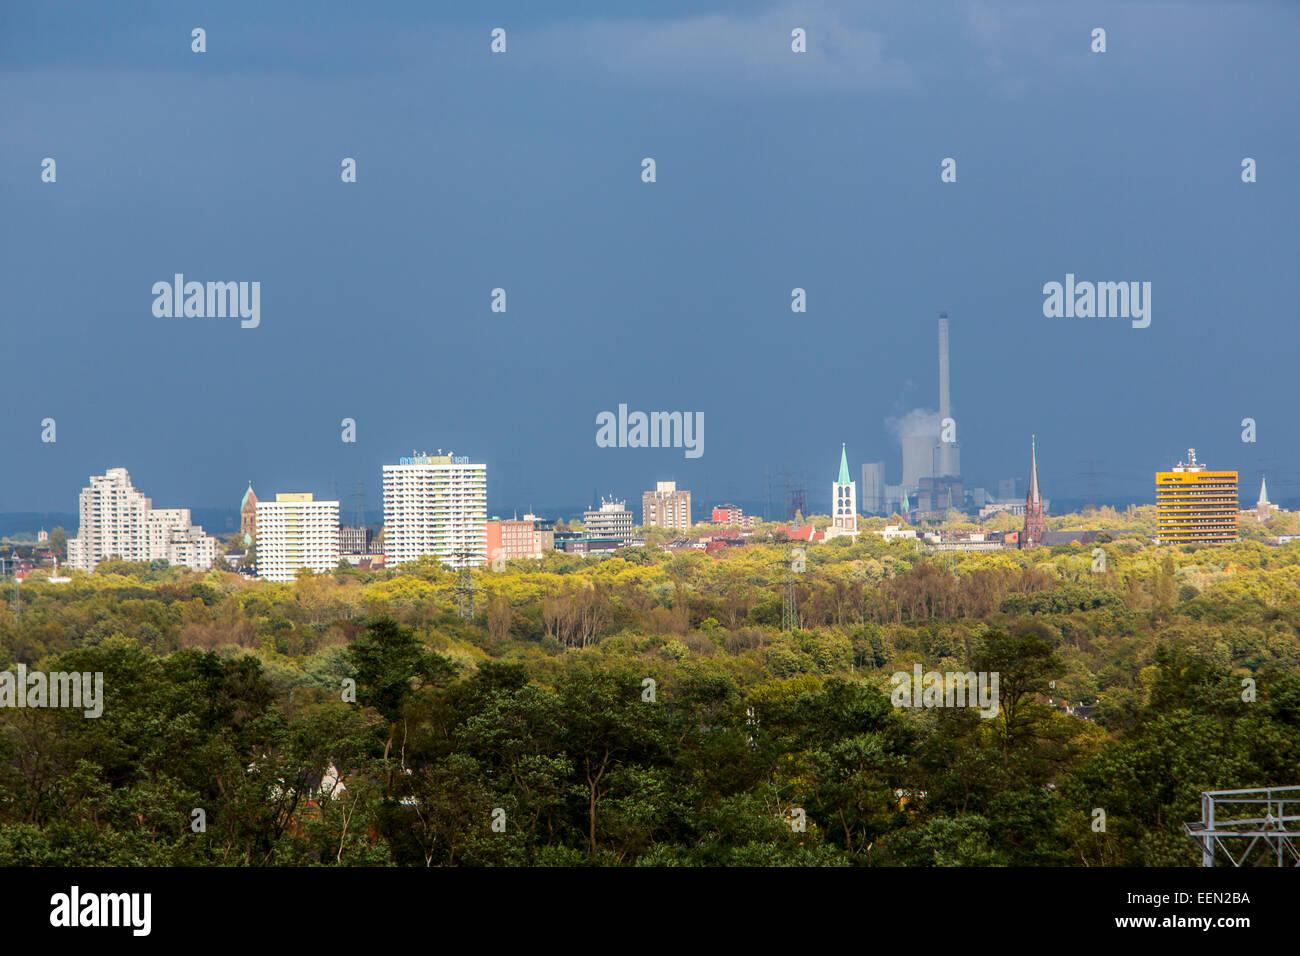 Skyline of Gelsenkirchen, Germany - Stock Image